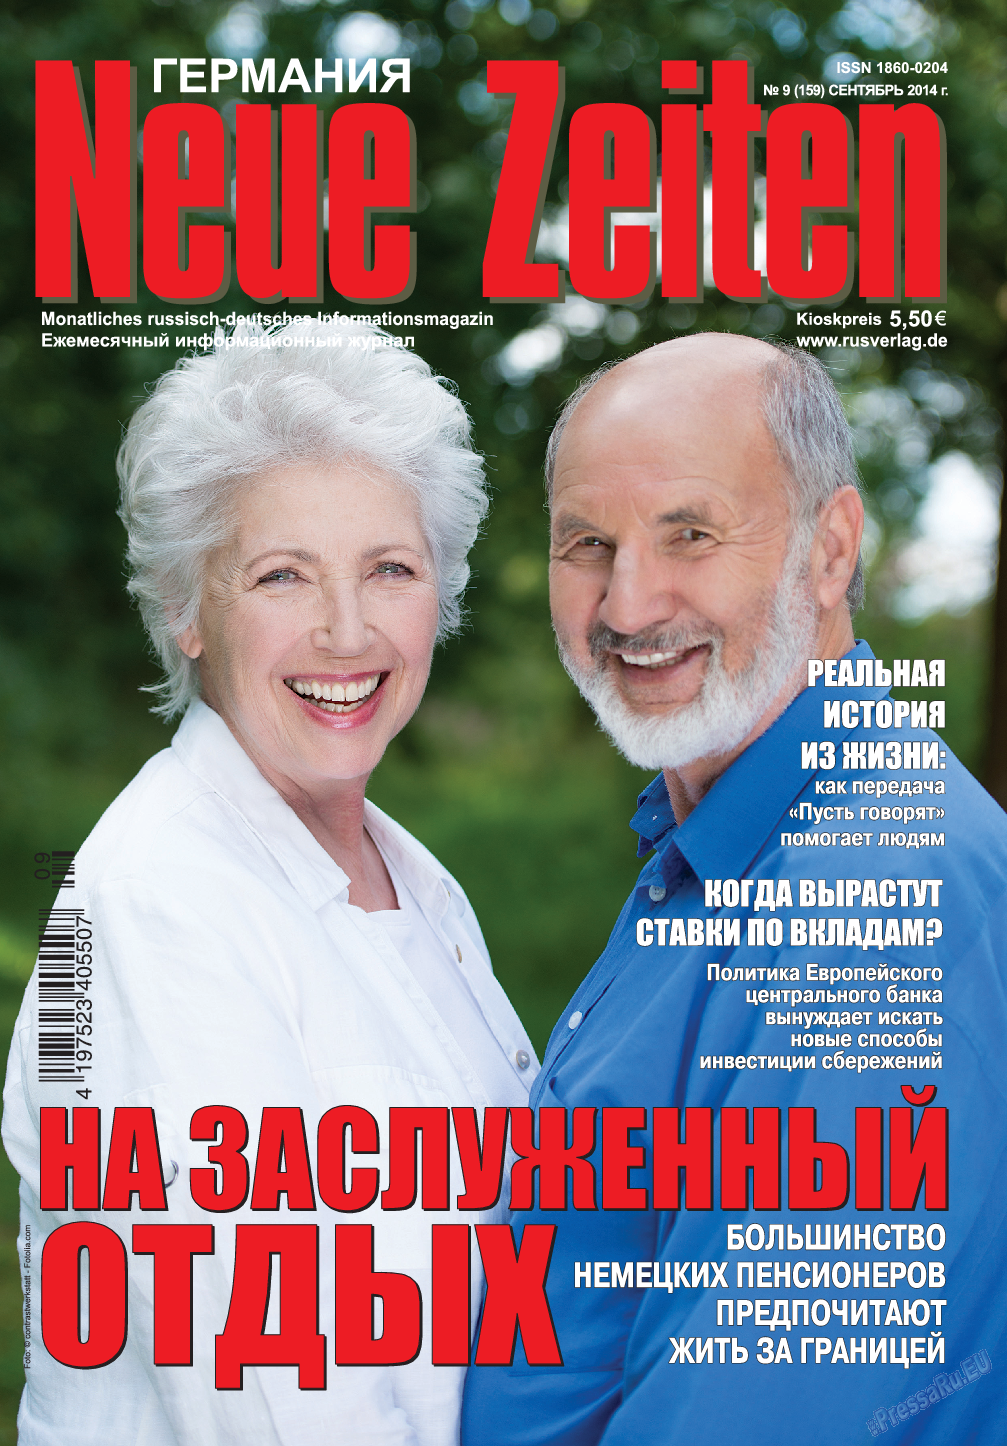 Neue Zeiten (журнал). 2014 год, номер 9, стр. 1